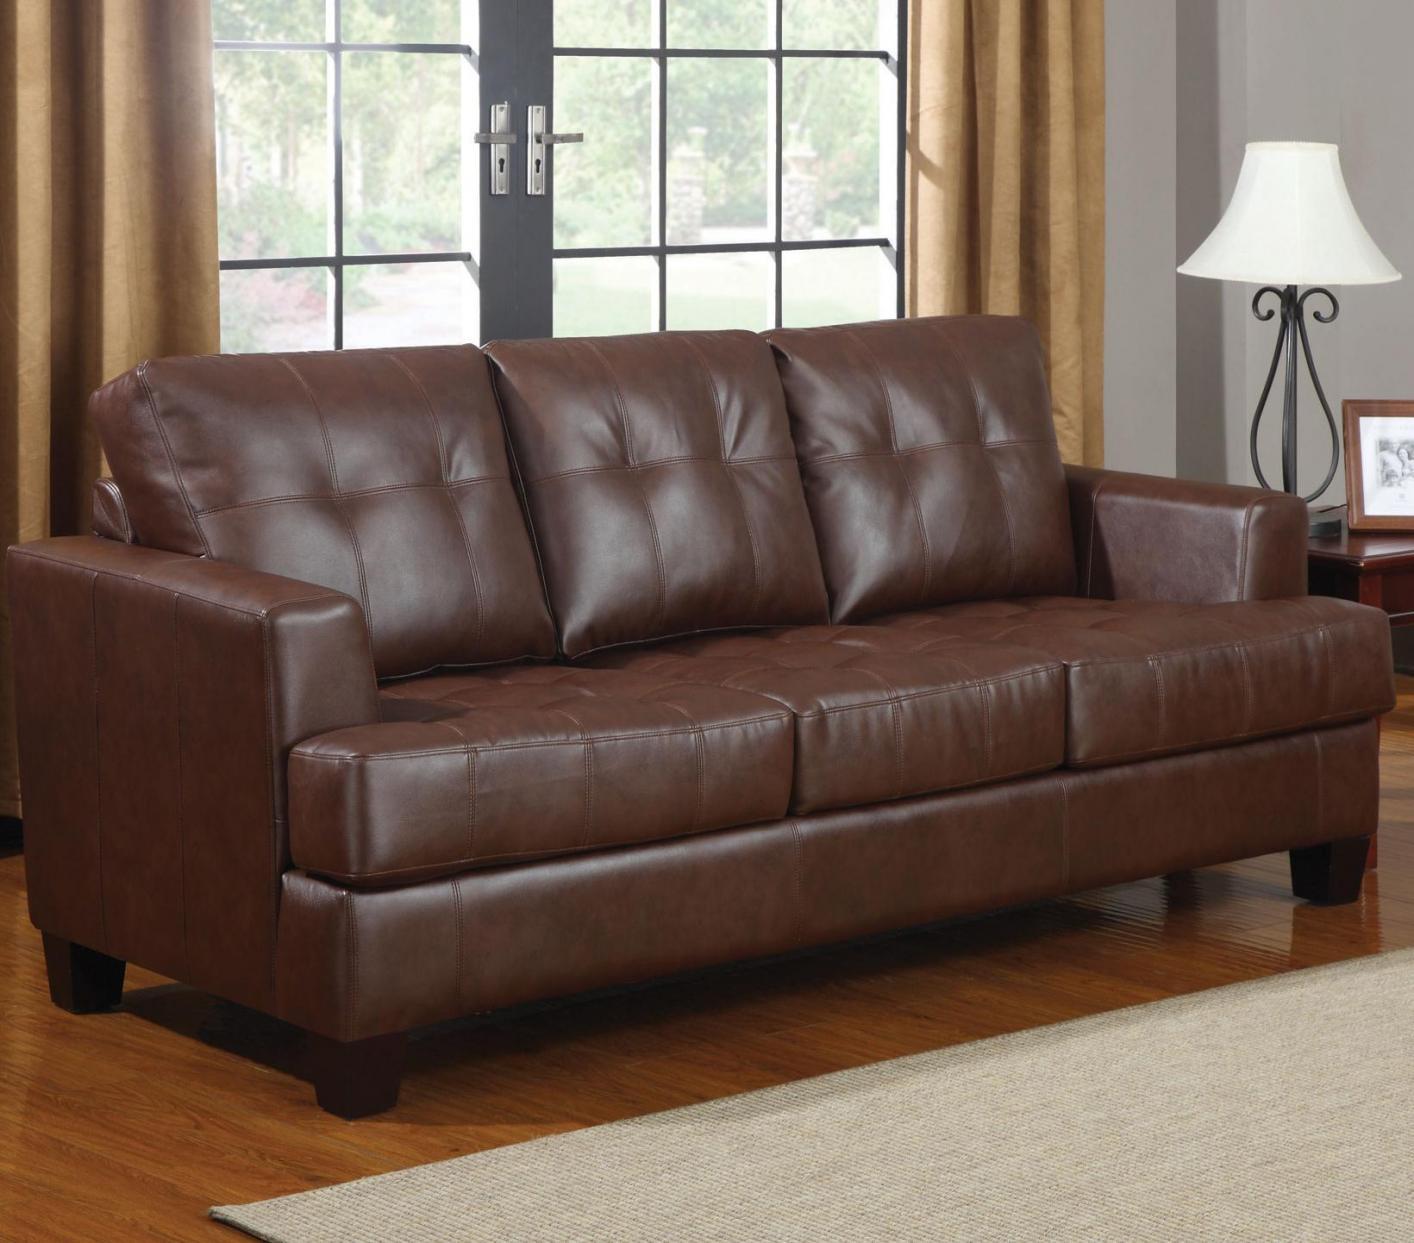 samuel brown leather sofa bed samuel brown leather sofa bed ... XDWBLKJ